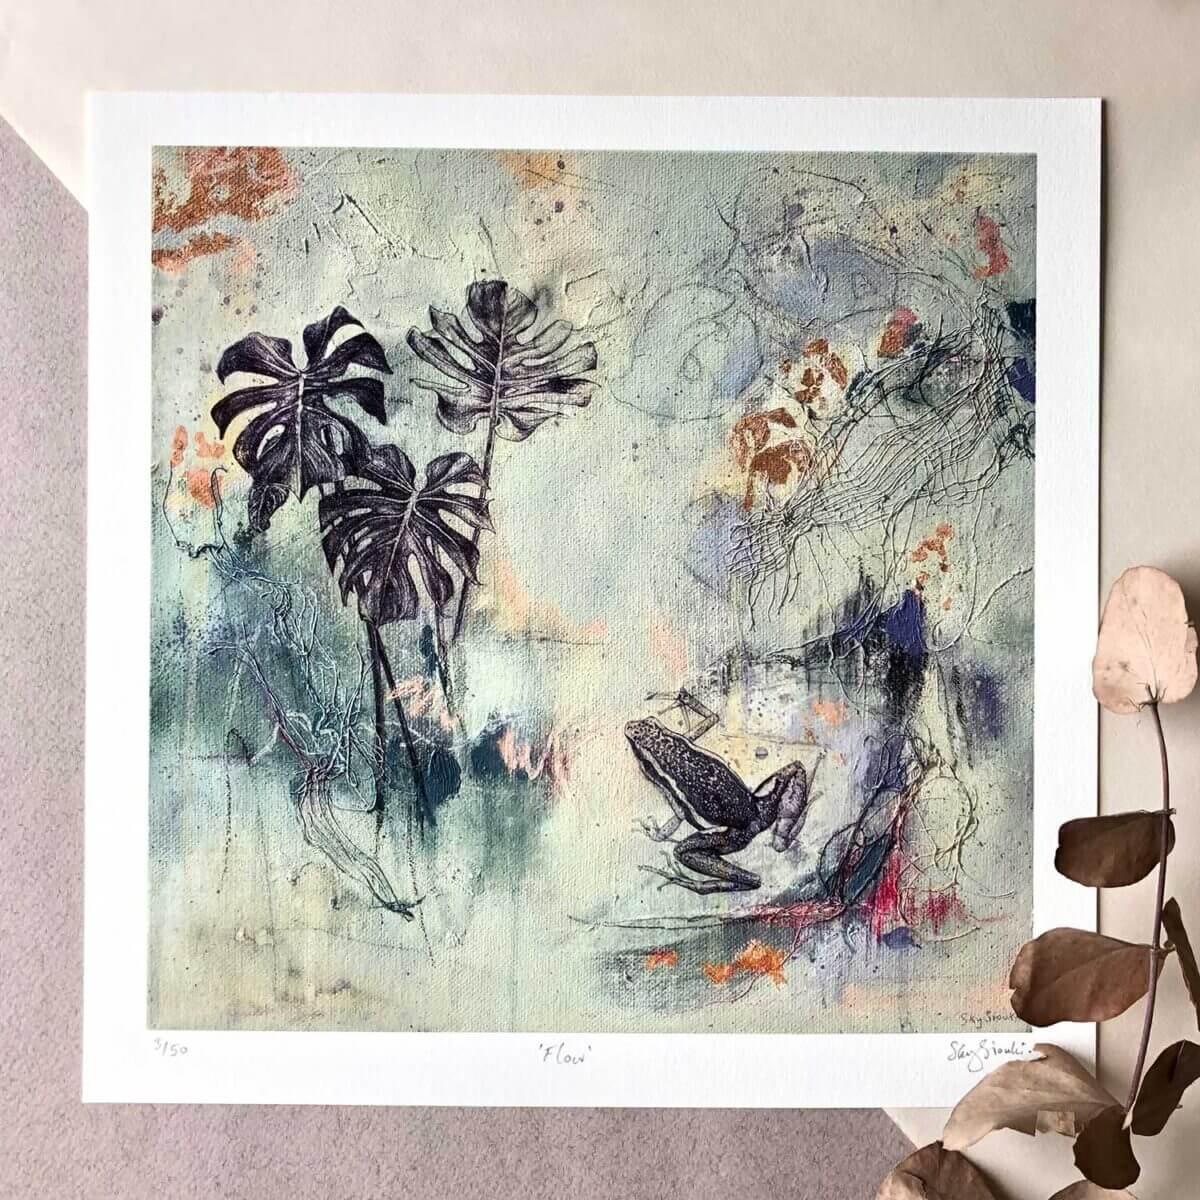 Flow-Print-Sky-Siouki